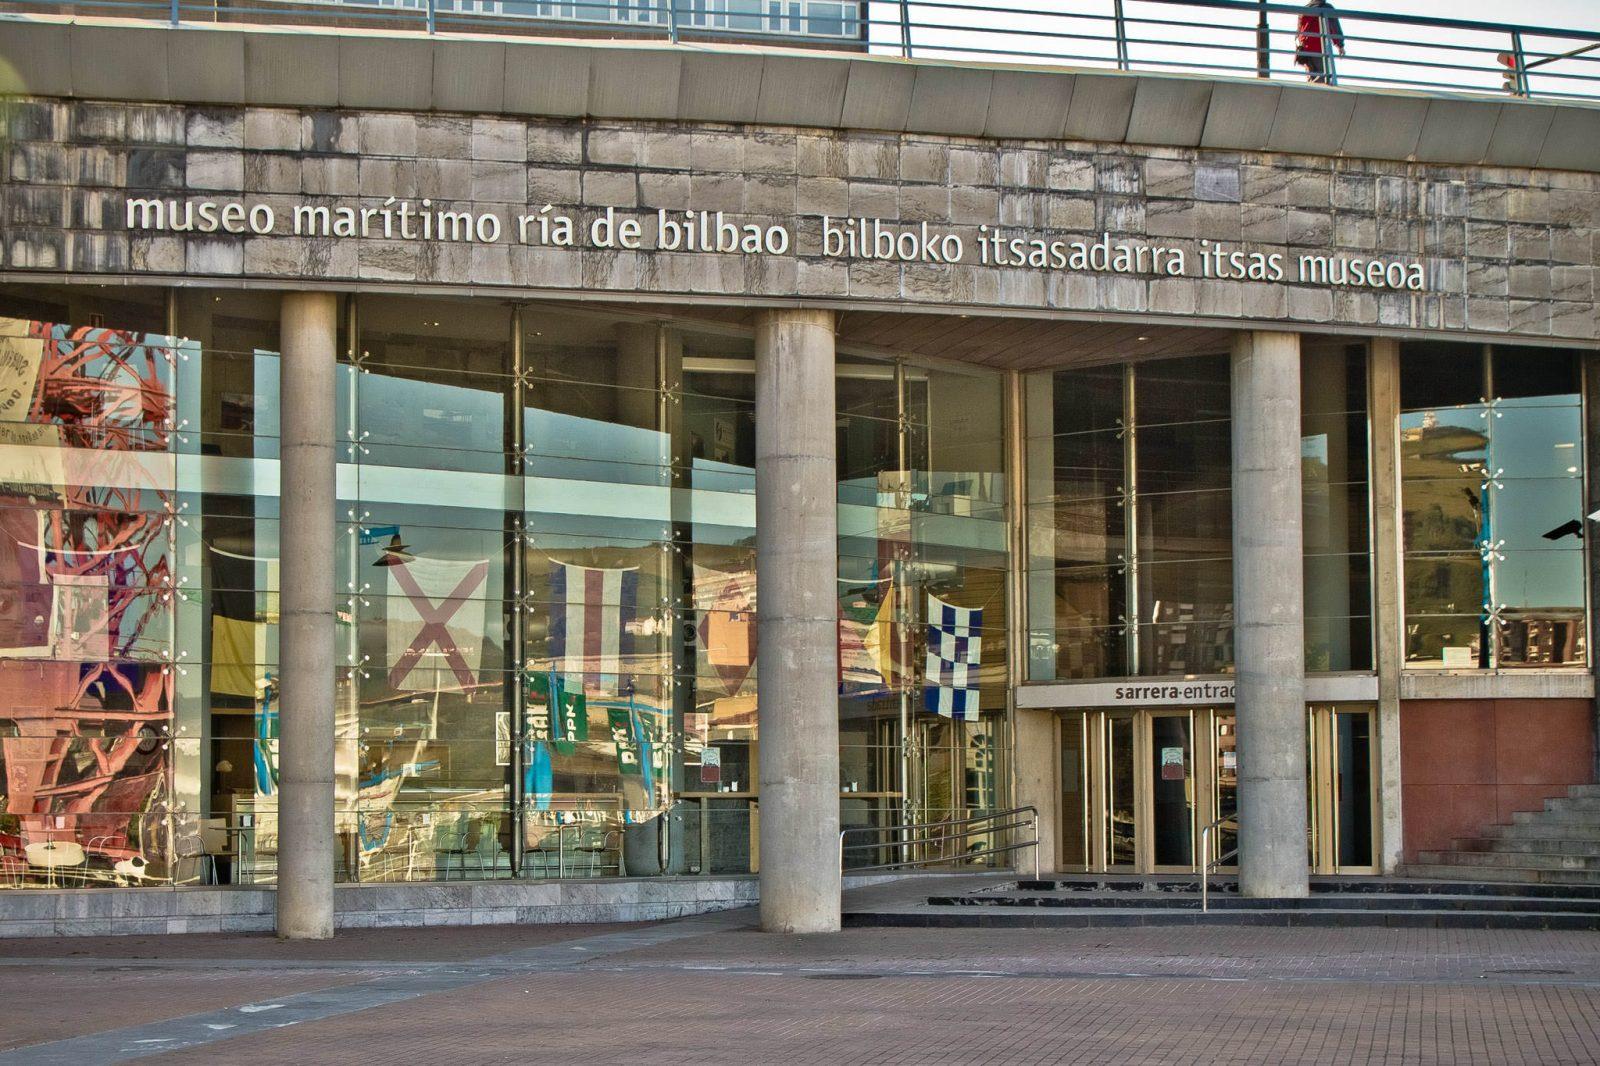 Музей Маритимо Риа де Бильбао (фото: Mikel Agirregabiria)